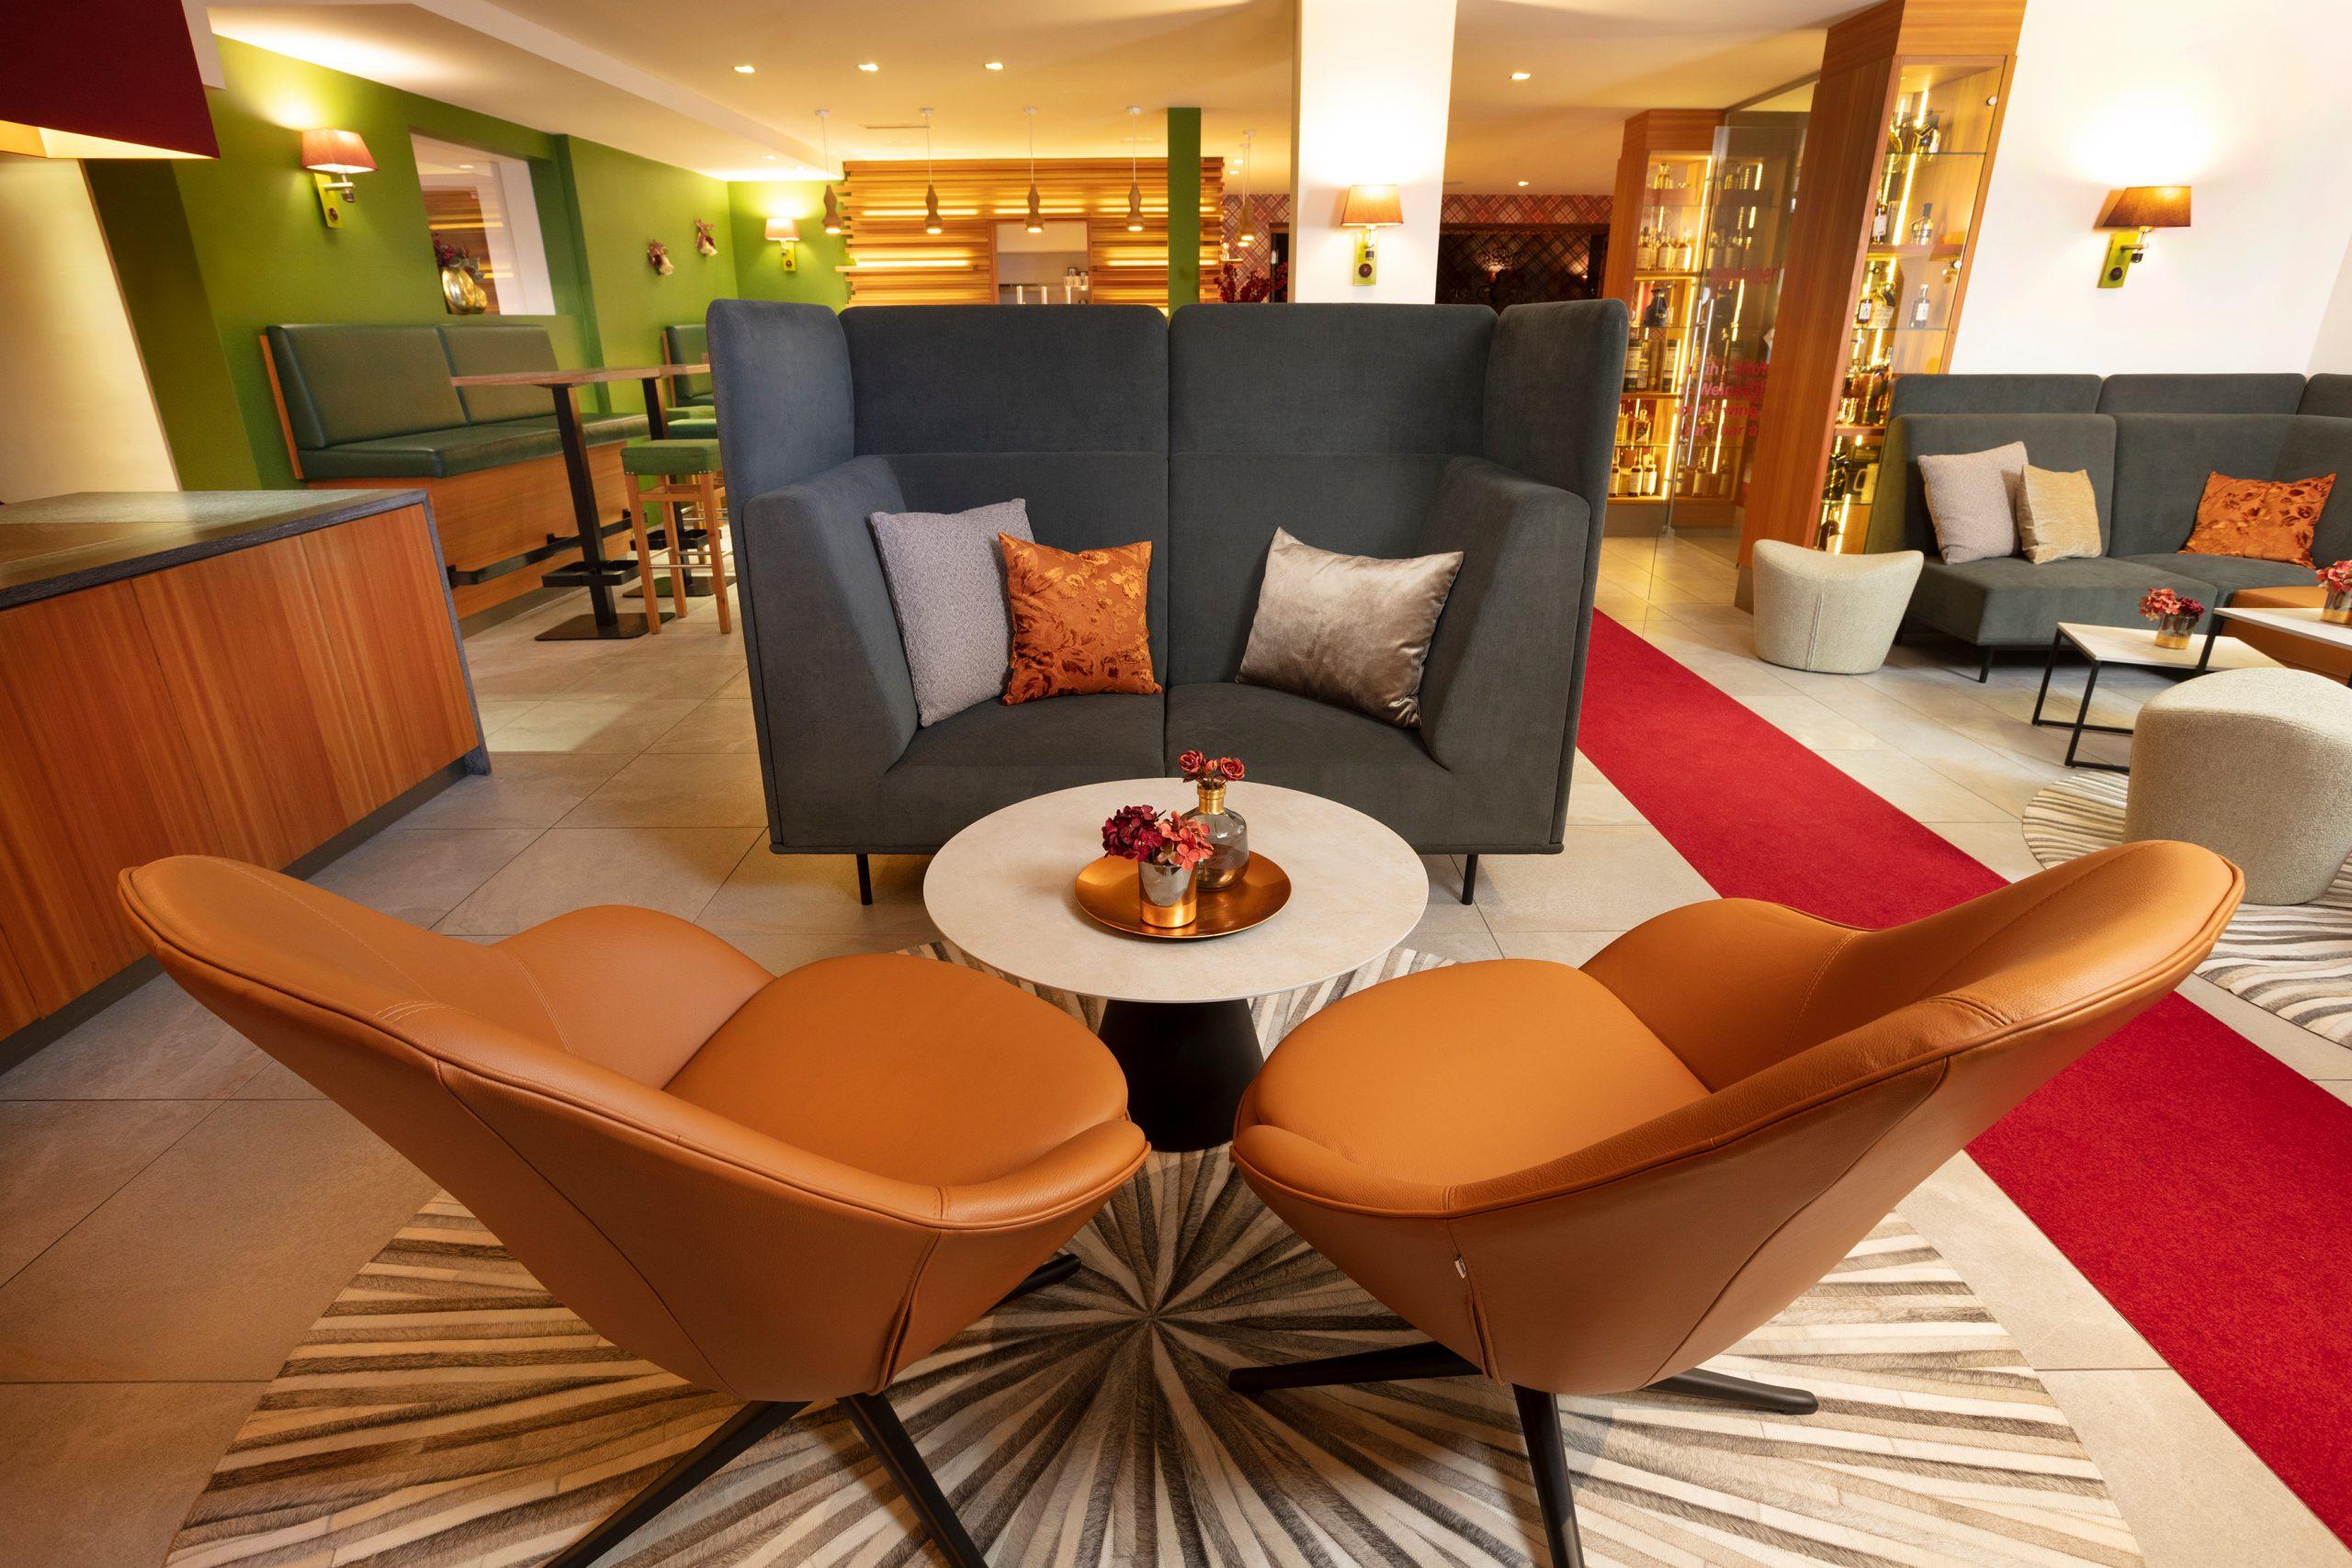 boconcept hotel bergland 1477401 10000 scaled